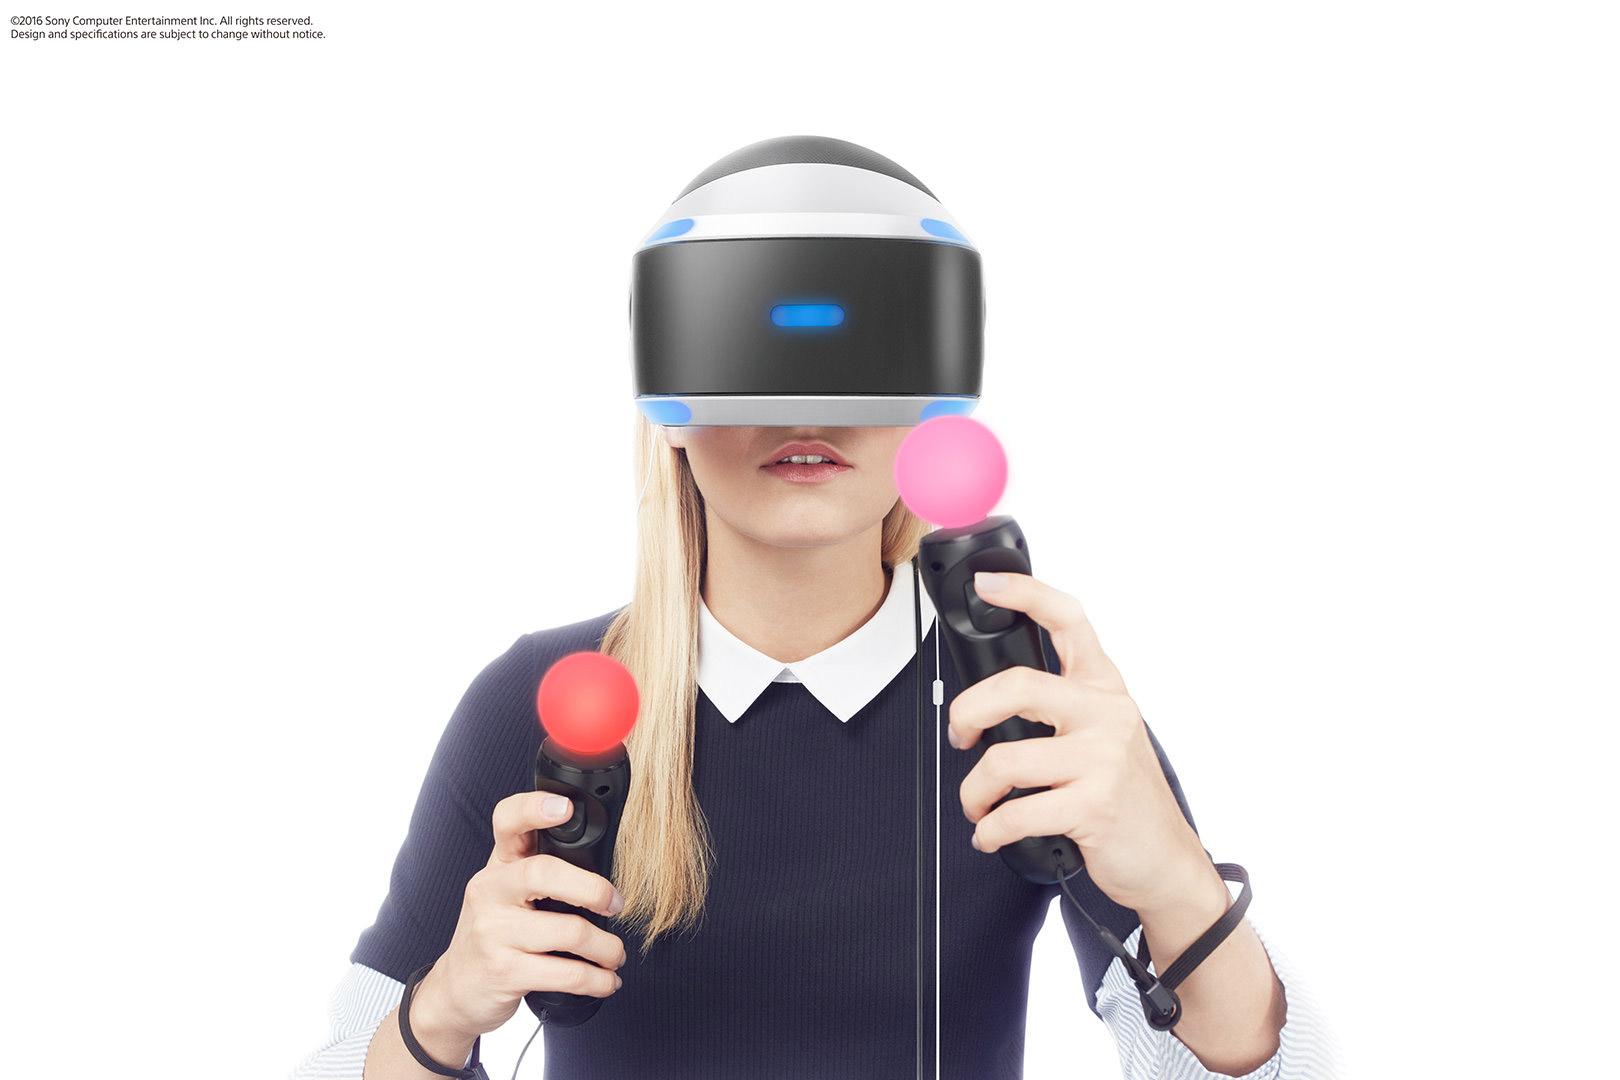 معرفی عینک واقعیت مجازی پلی استیشن 4